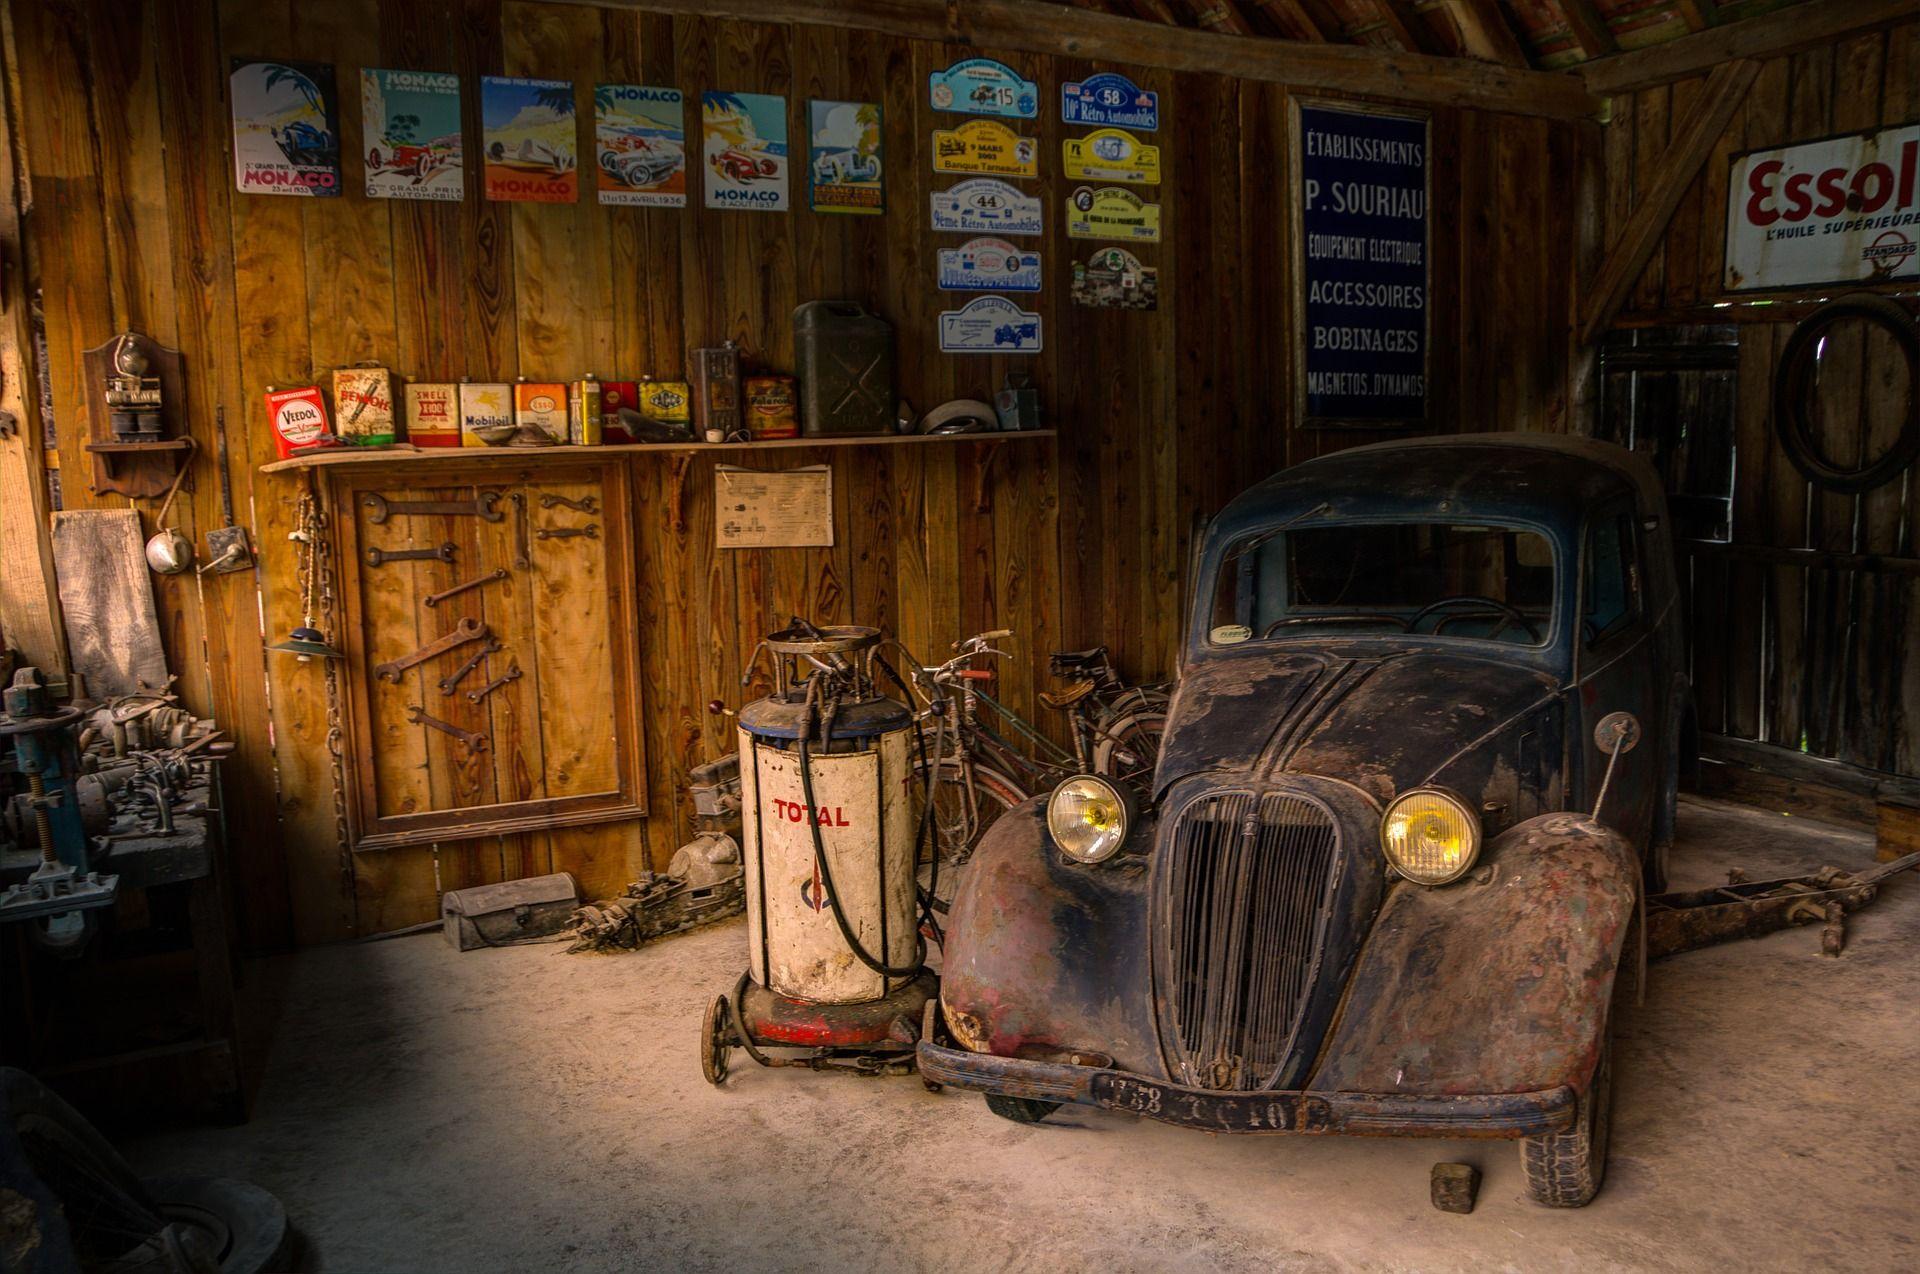 garage-943249_1920.jpg (1920×1274) | ABANDONED | Pinterest | Abandoned